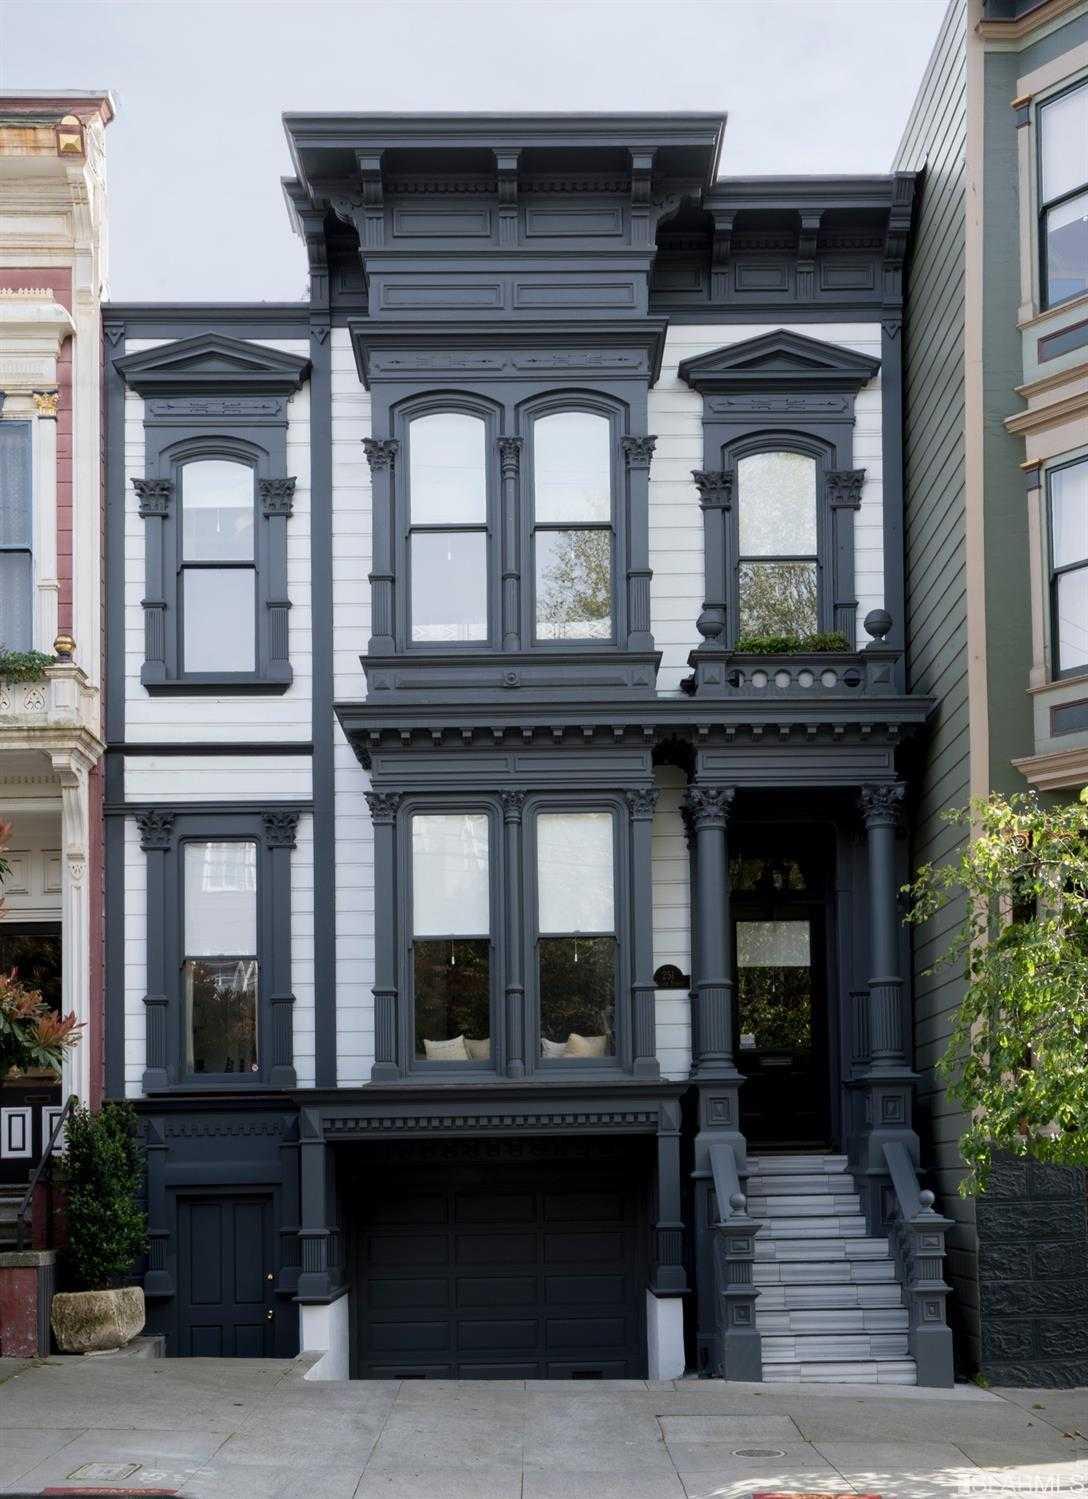 251 Waller Street San Francisco, CA 94102